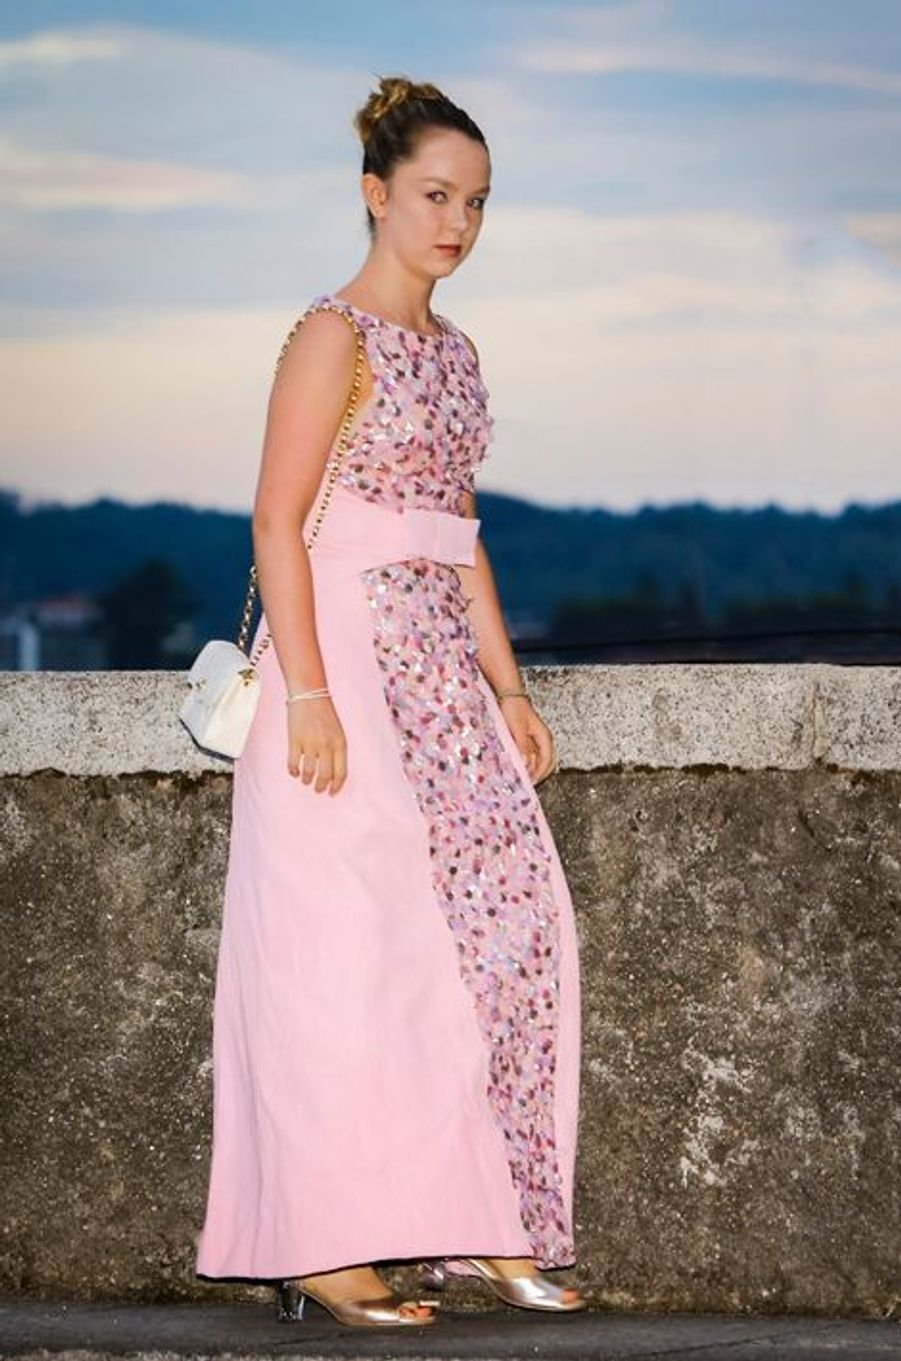 La princesse Alexandra de Hanovre à Angera, le 1er août 2015